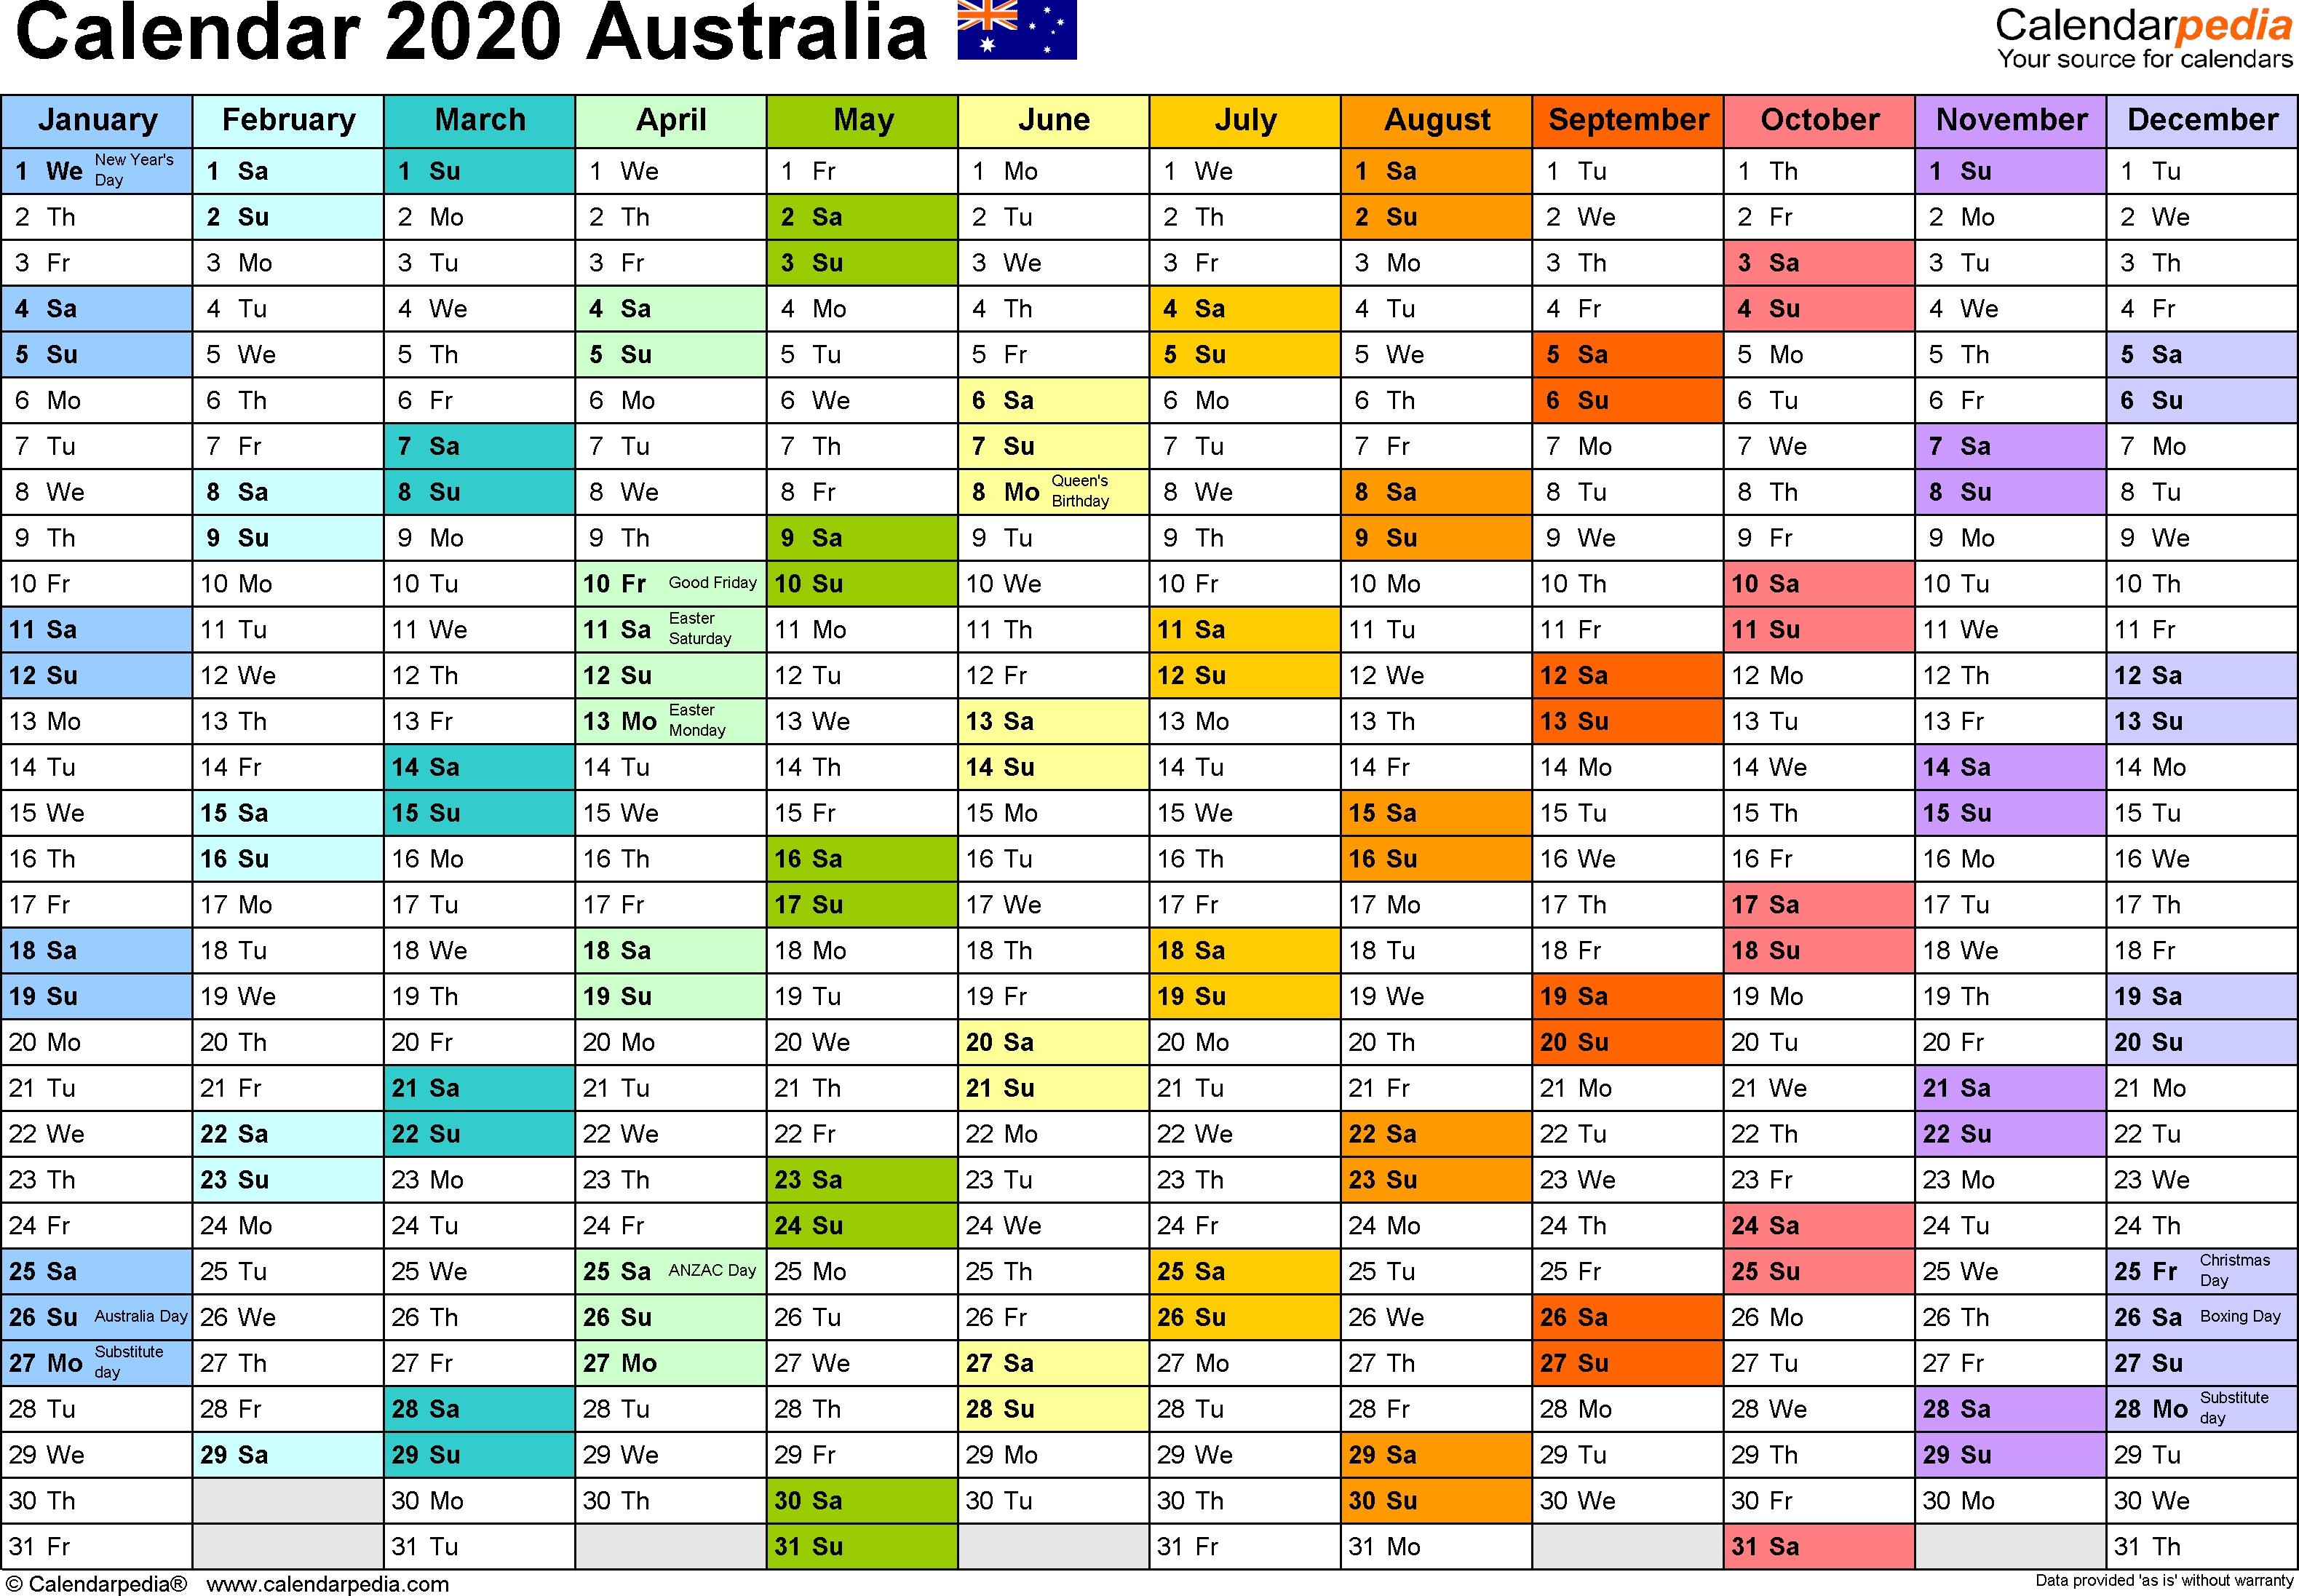 Australia Calendar 2020 - Free Printable Word Templates-Blank Qld Calendar 2020